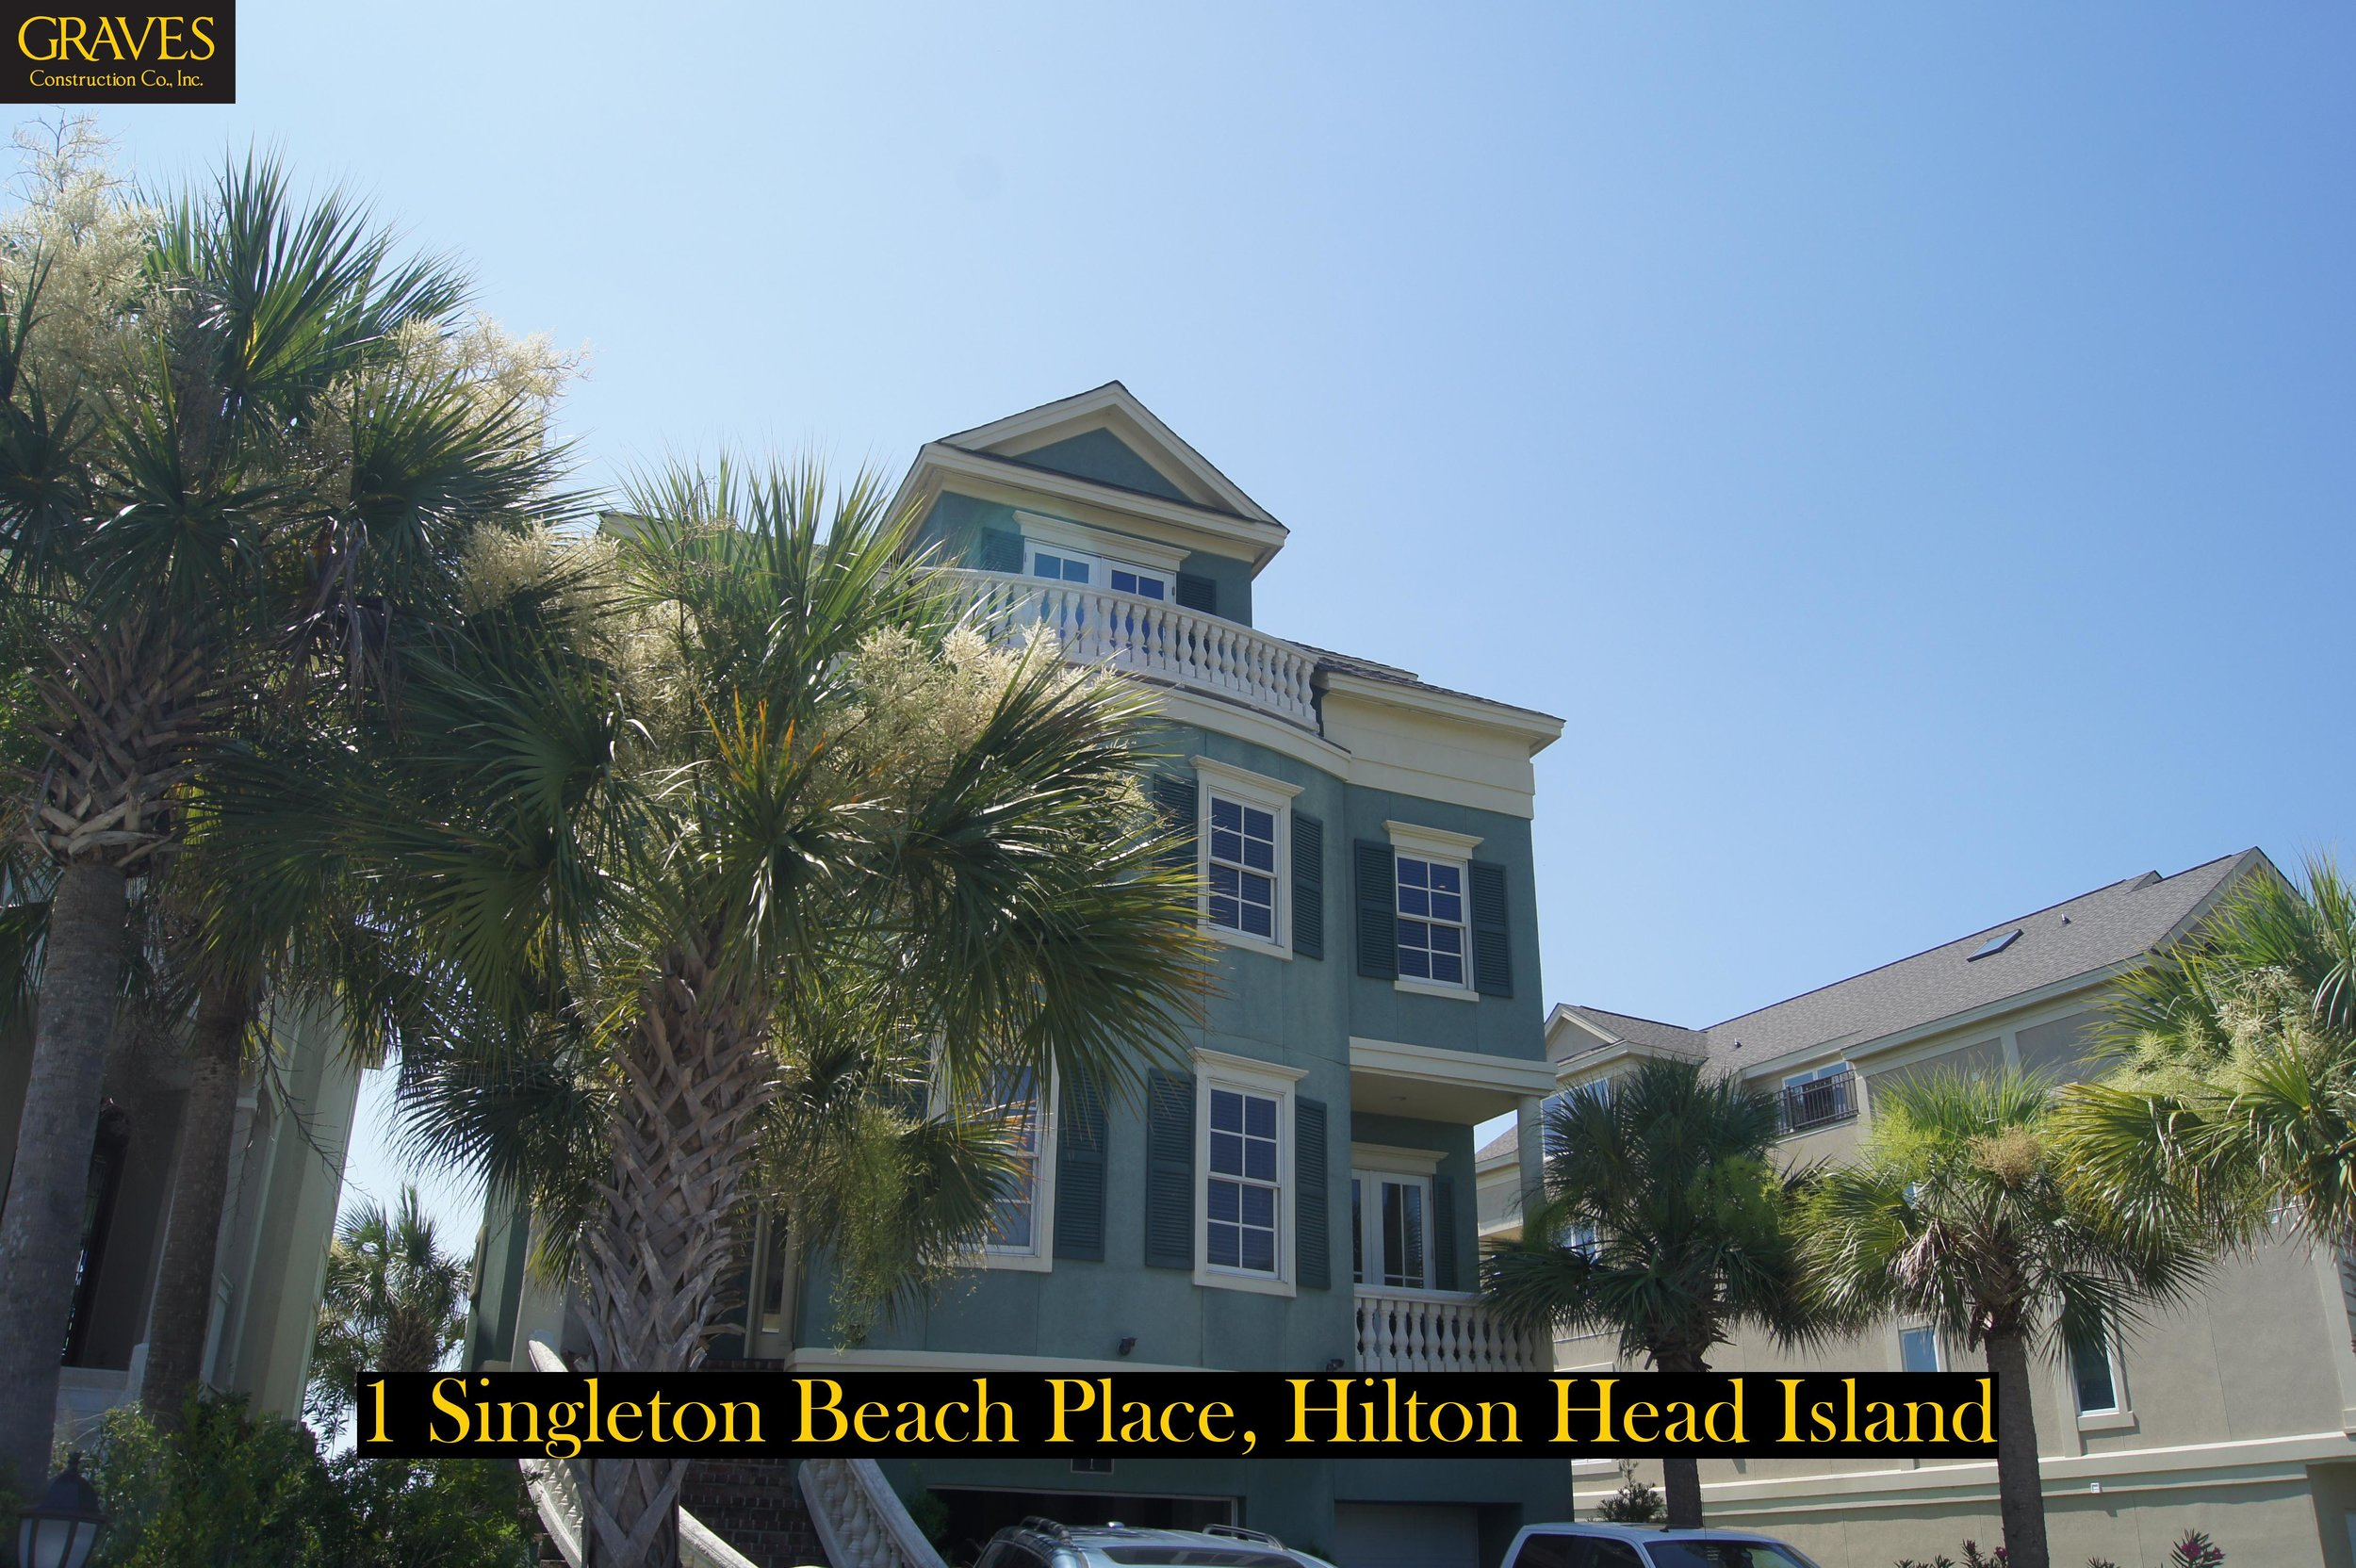 1 Singleton Beach Pl - 6